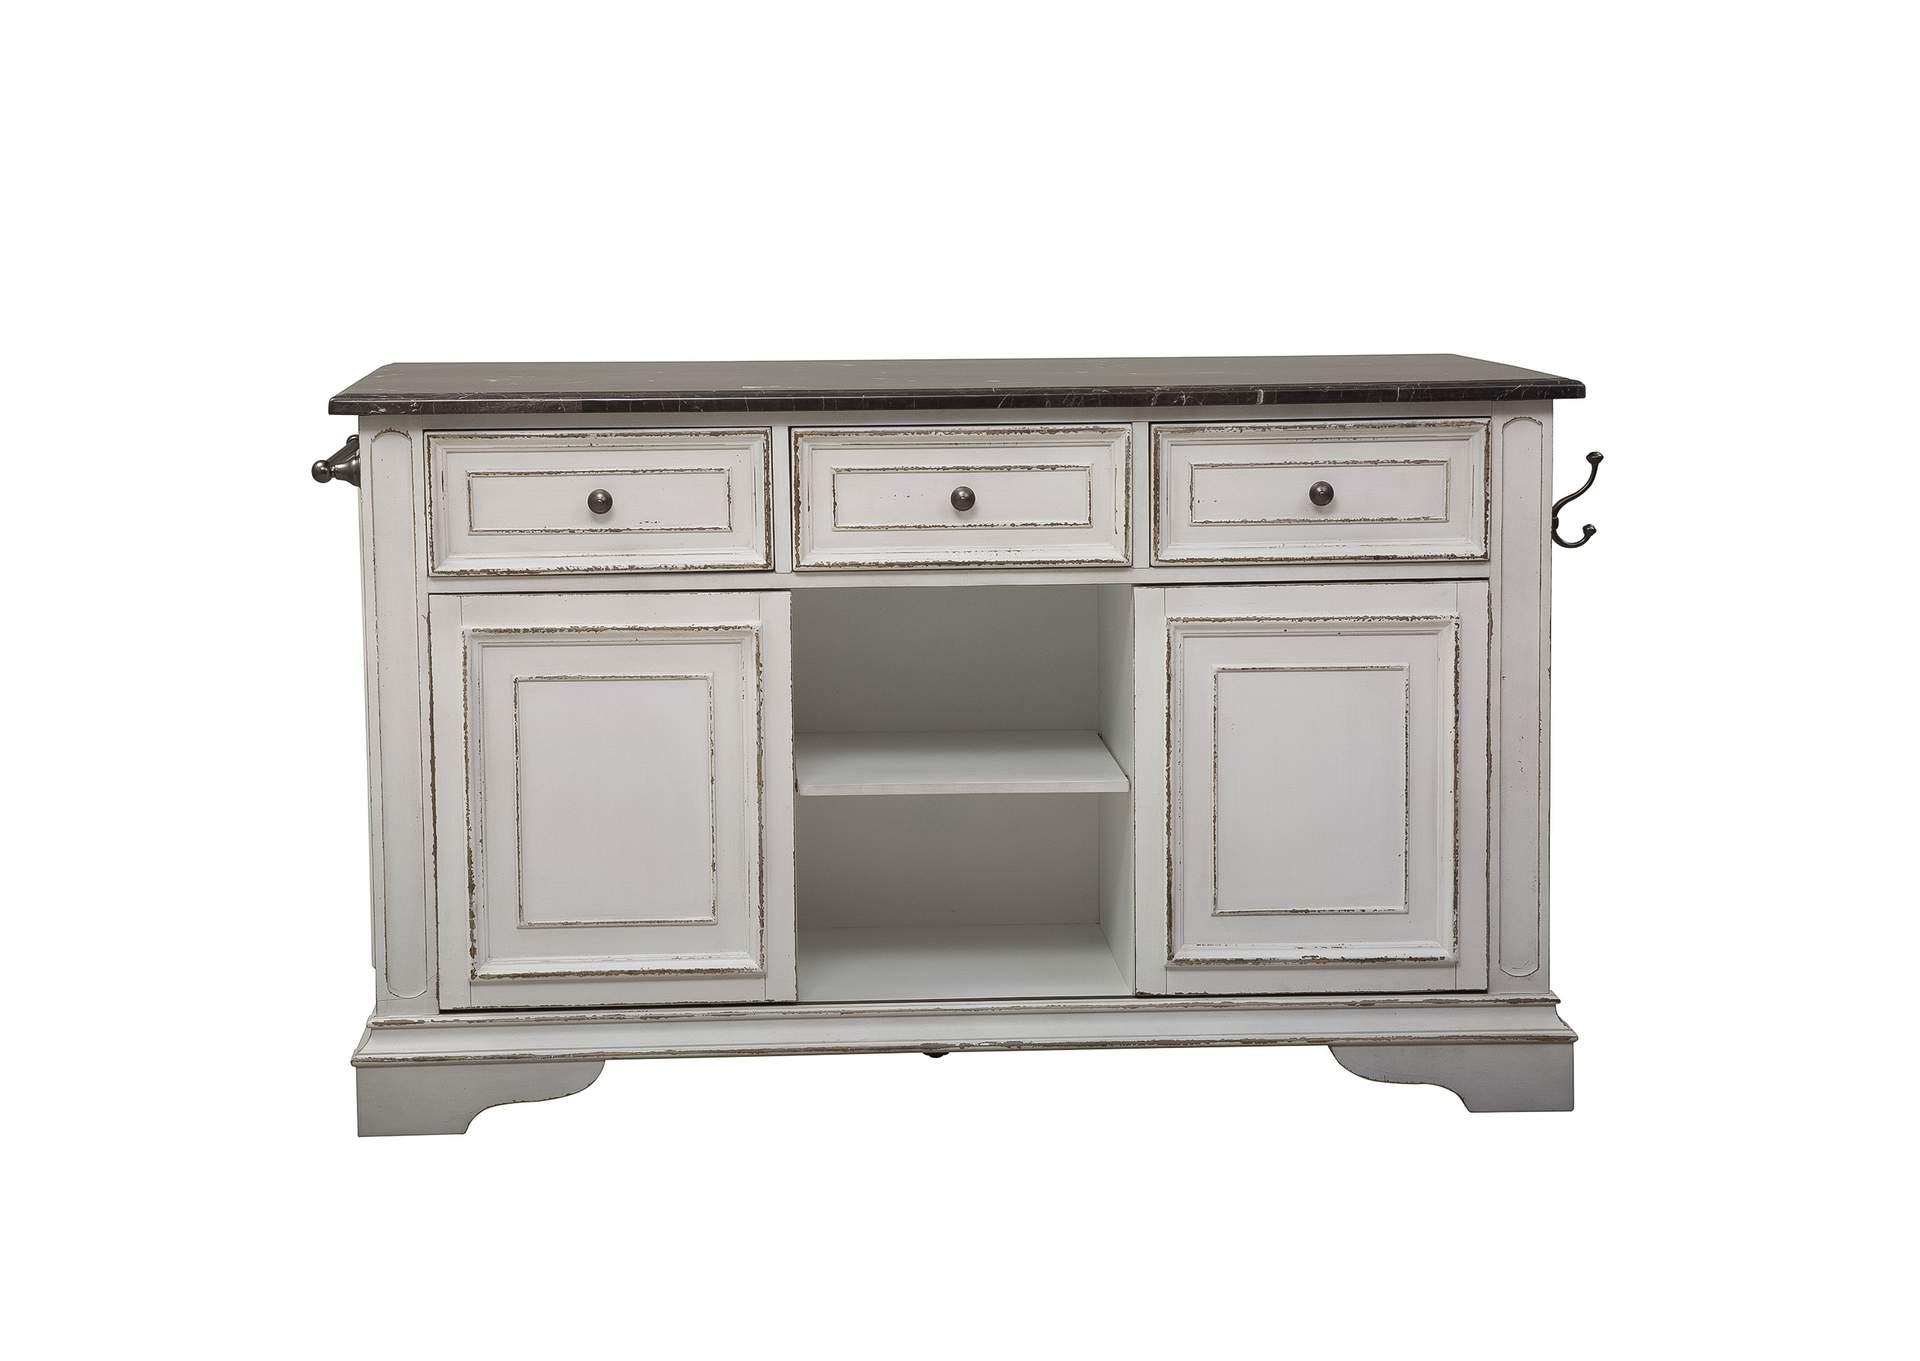 Jesup Furniture Outlet Magnolia Manor White Kitchen Island ...